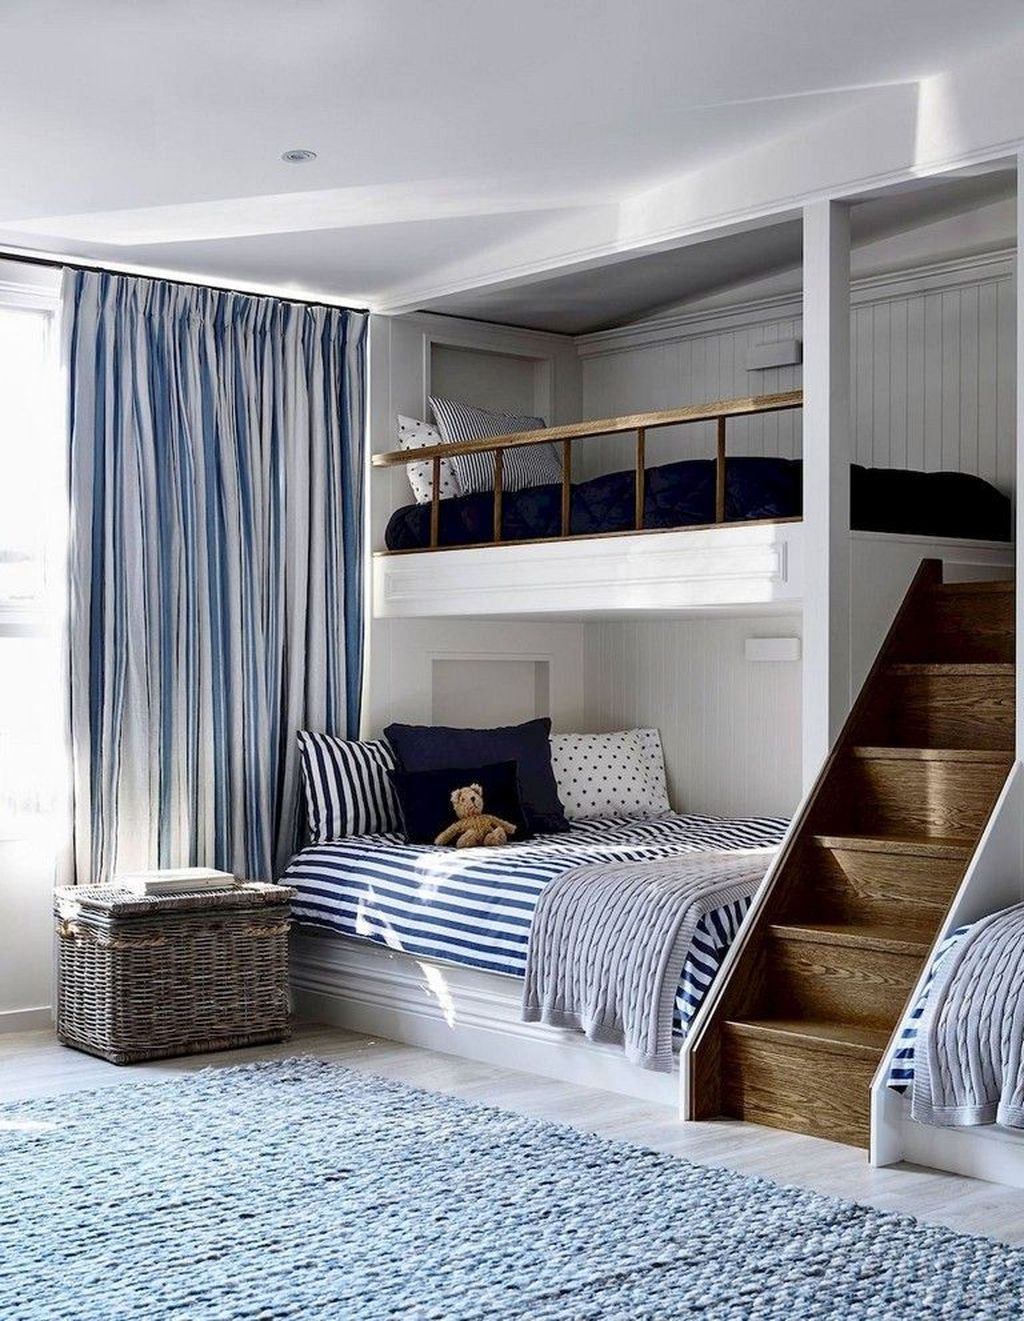 Stunning Bedding Ideas For Cozy Bedroom 15